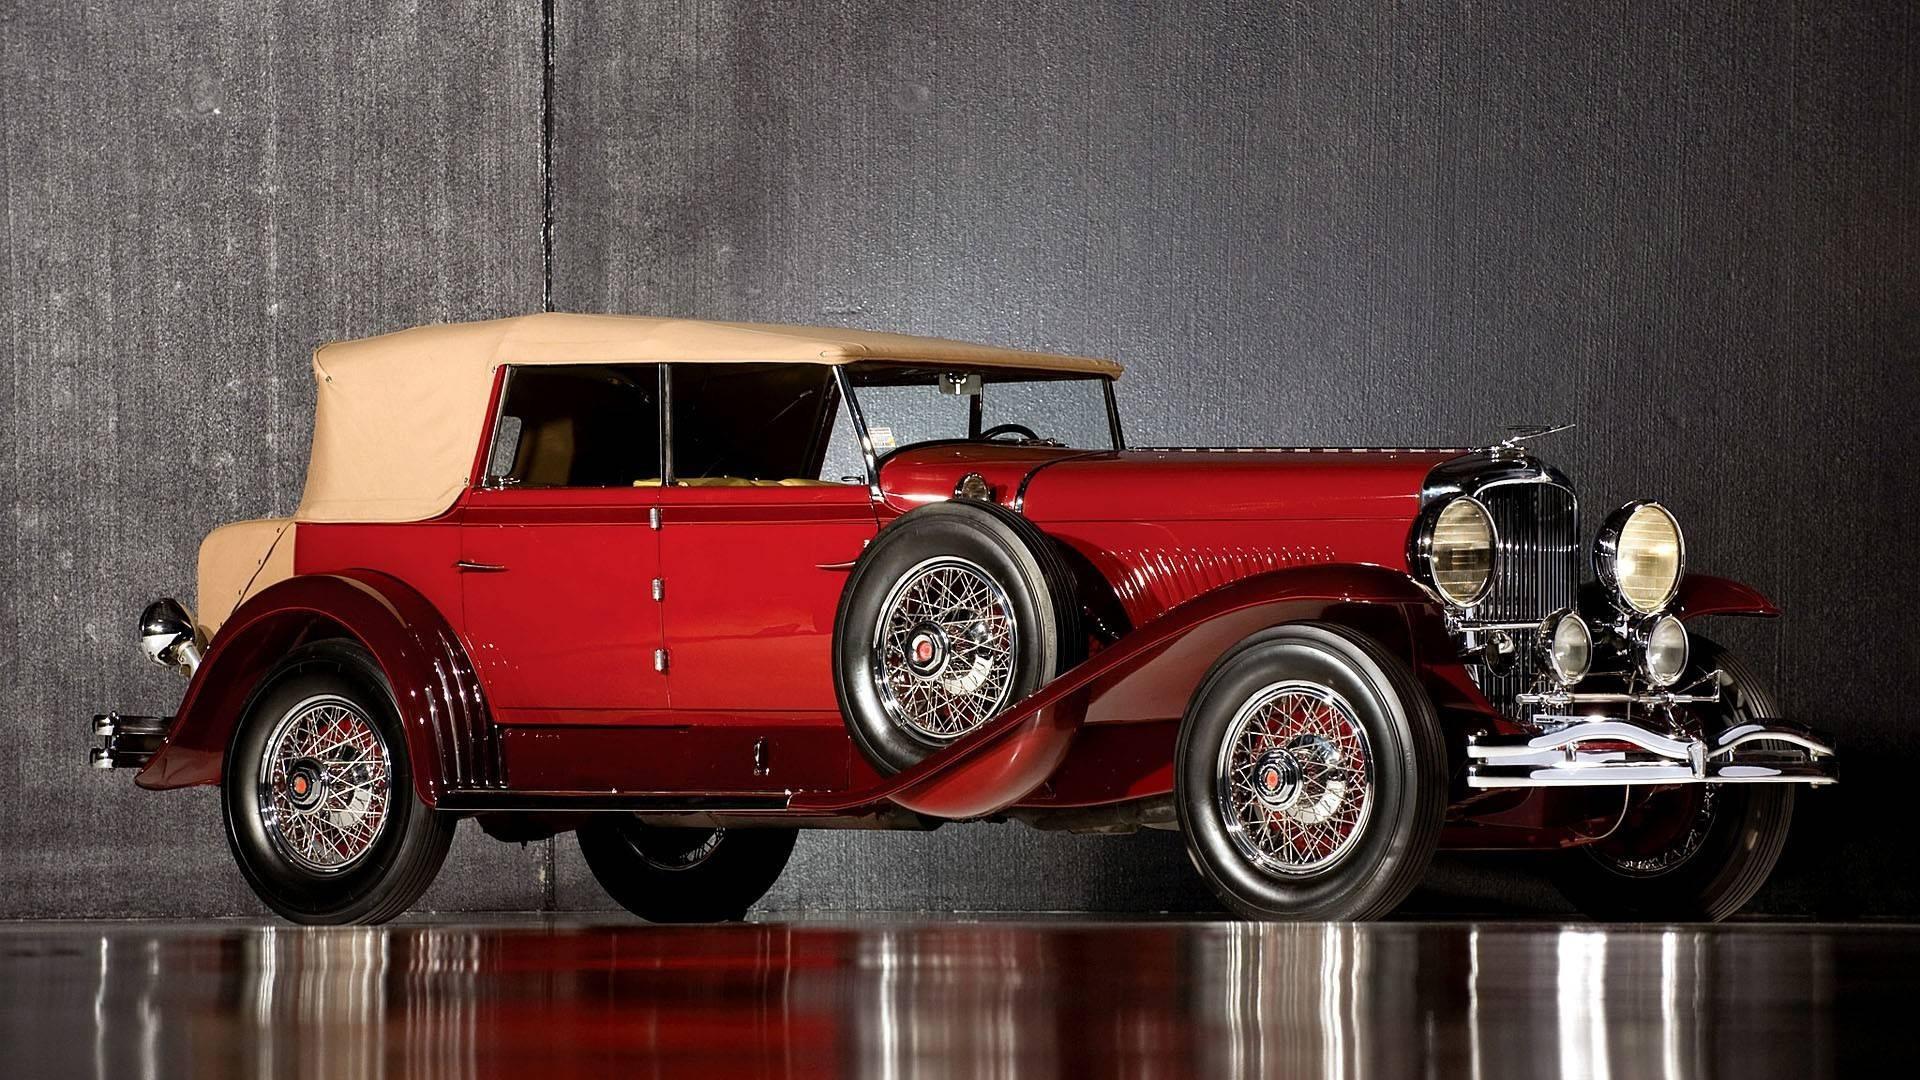 Res: 1920x1080, Vintage, Car, HD, Desktop, Wallpapers, Free, Old, Car, Images, Download  Wallpapers, Artwork, Free,